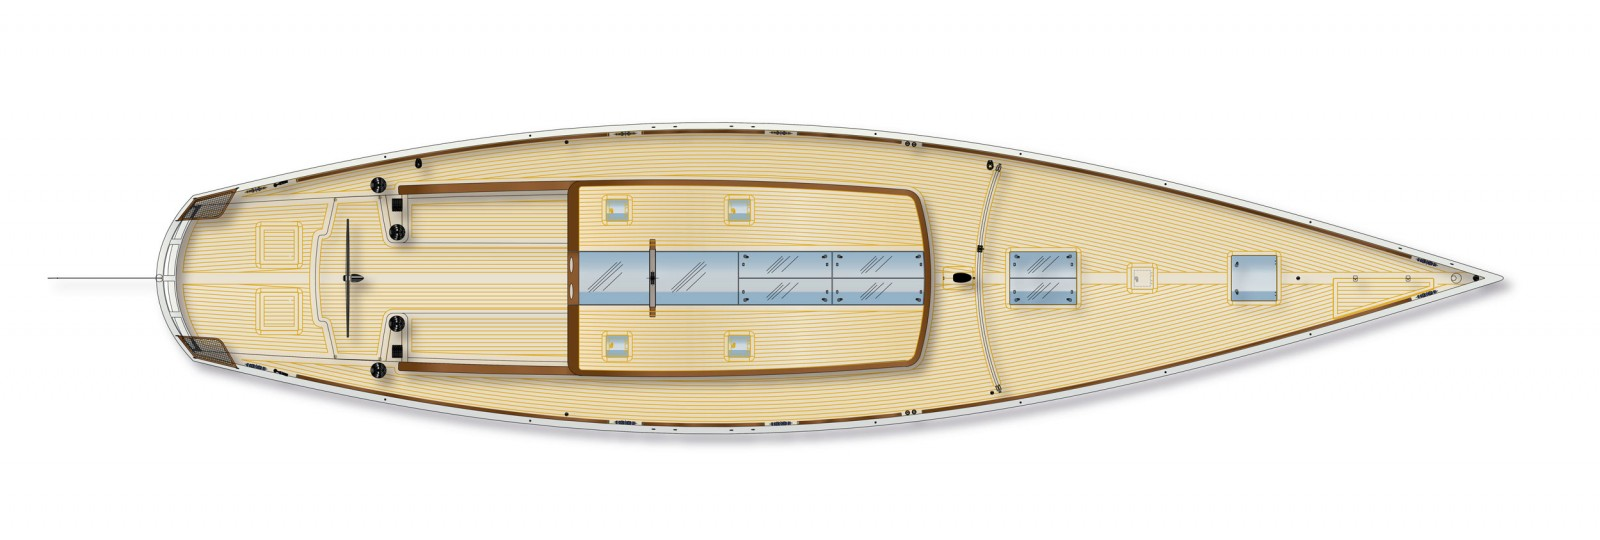 McCONAGHY classic 67 deck plan